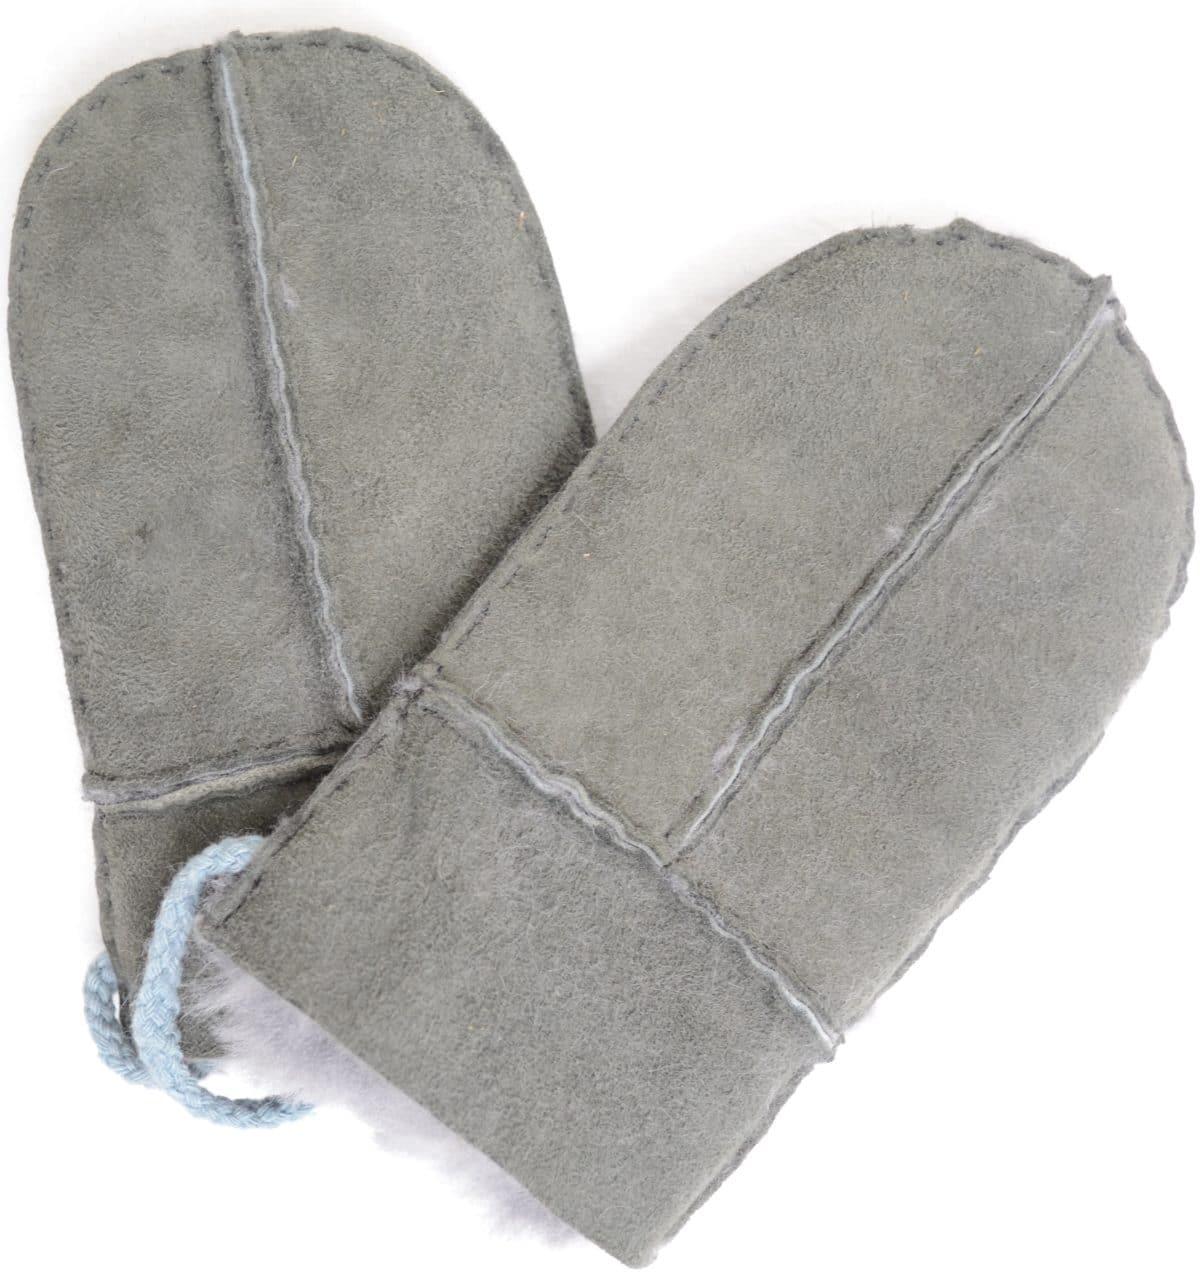 Sheepskin Baby Mittens - Charcoal